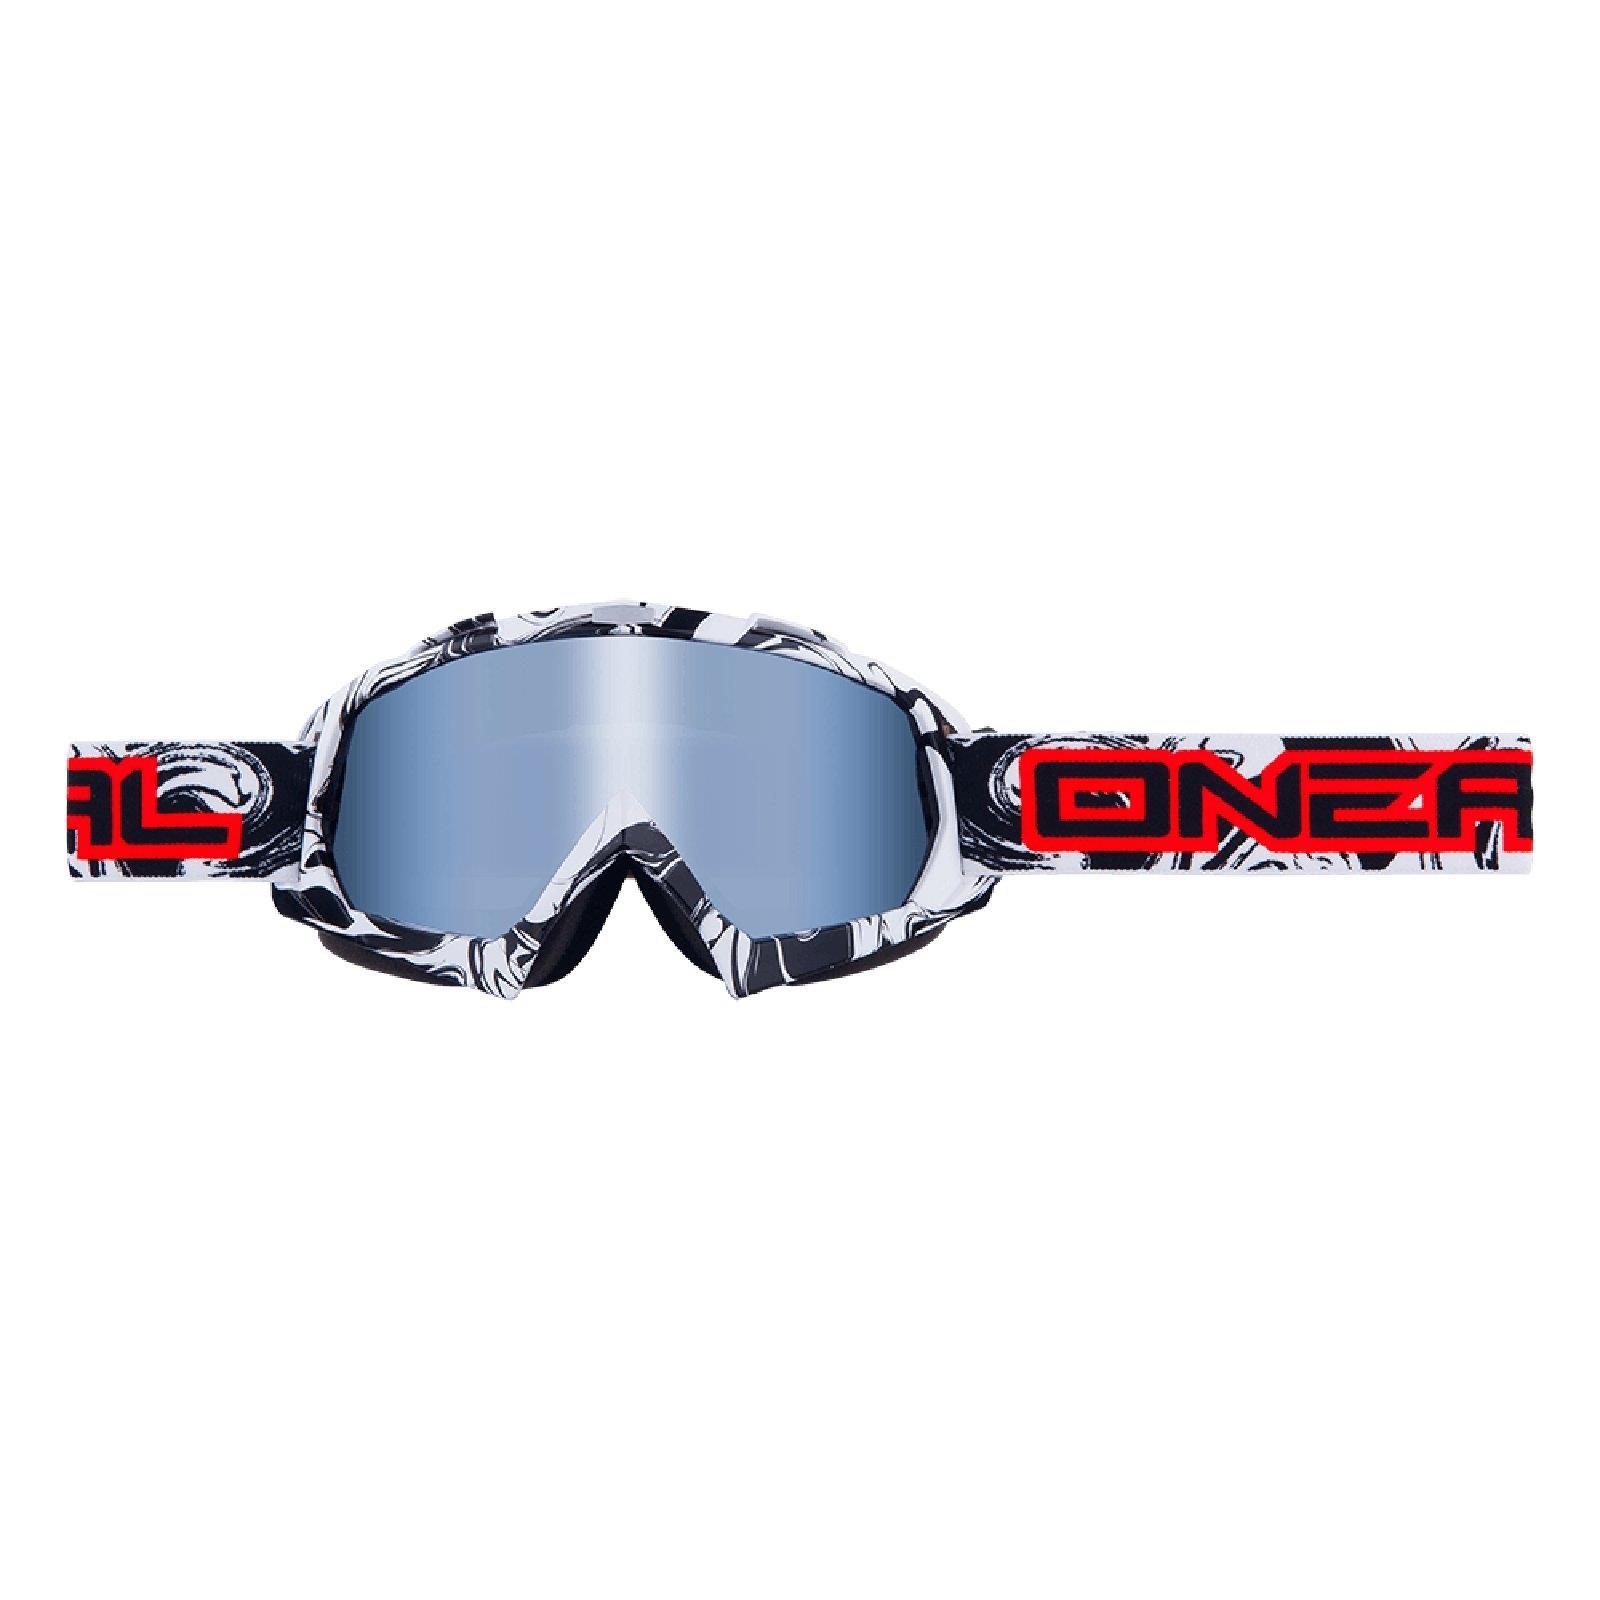 O-039-Neal-B-FLEX-chiaramente-MX-Goggle-Motocross-Occhiali-moto-Downhill-Mountain-Bike-DH miniatura 10